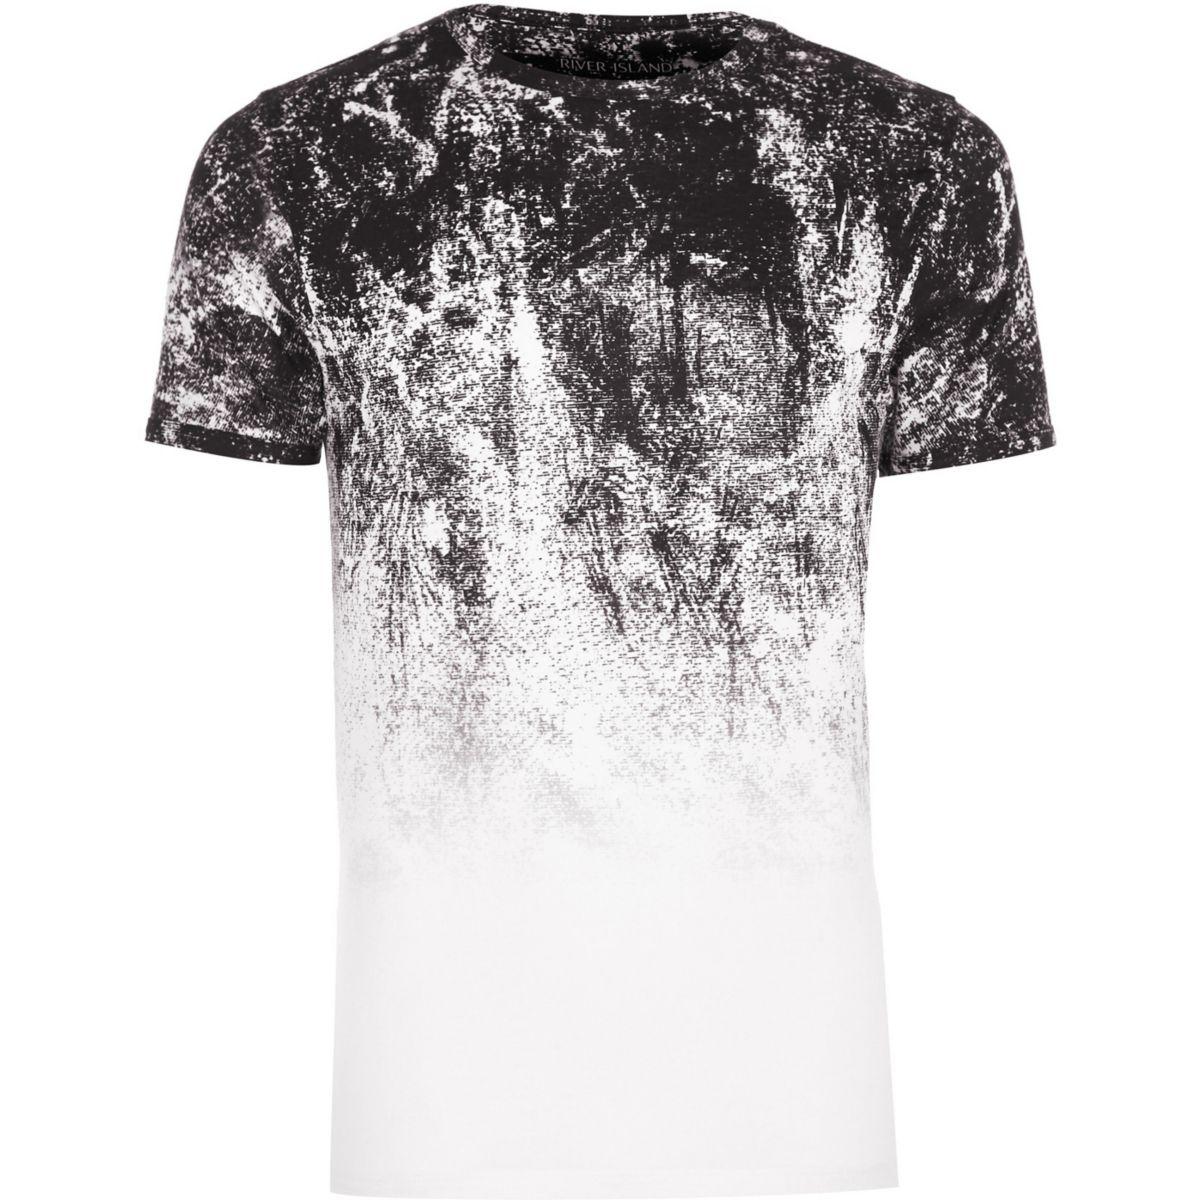 Big and Tall white glitch fade T-shirt